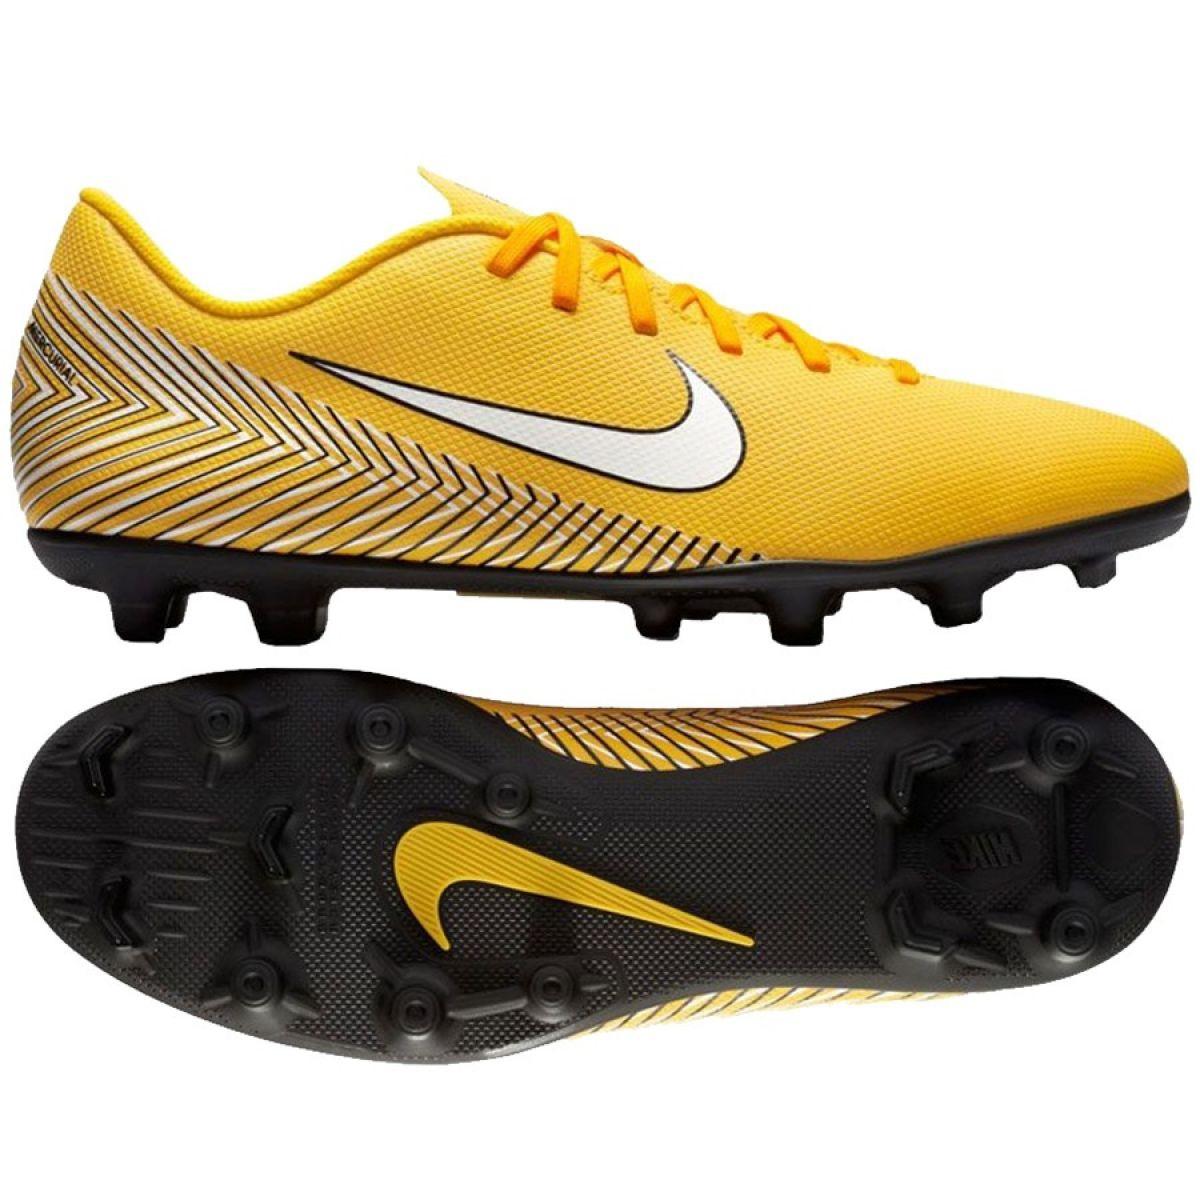 Vapor Mercurial 12 Club Chaussures Nike Neymar De M Football Mg rdBQoCWxe